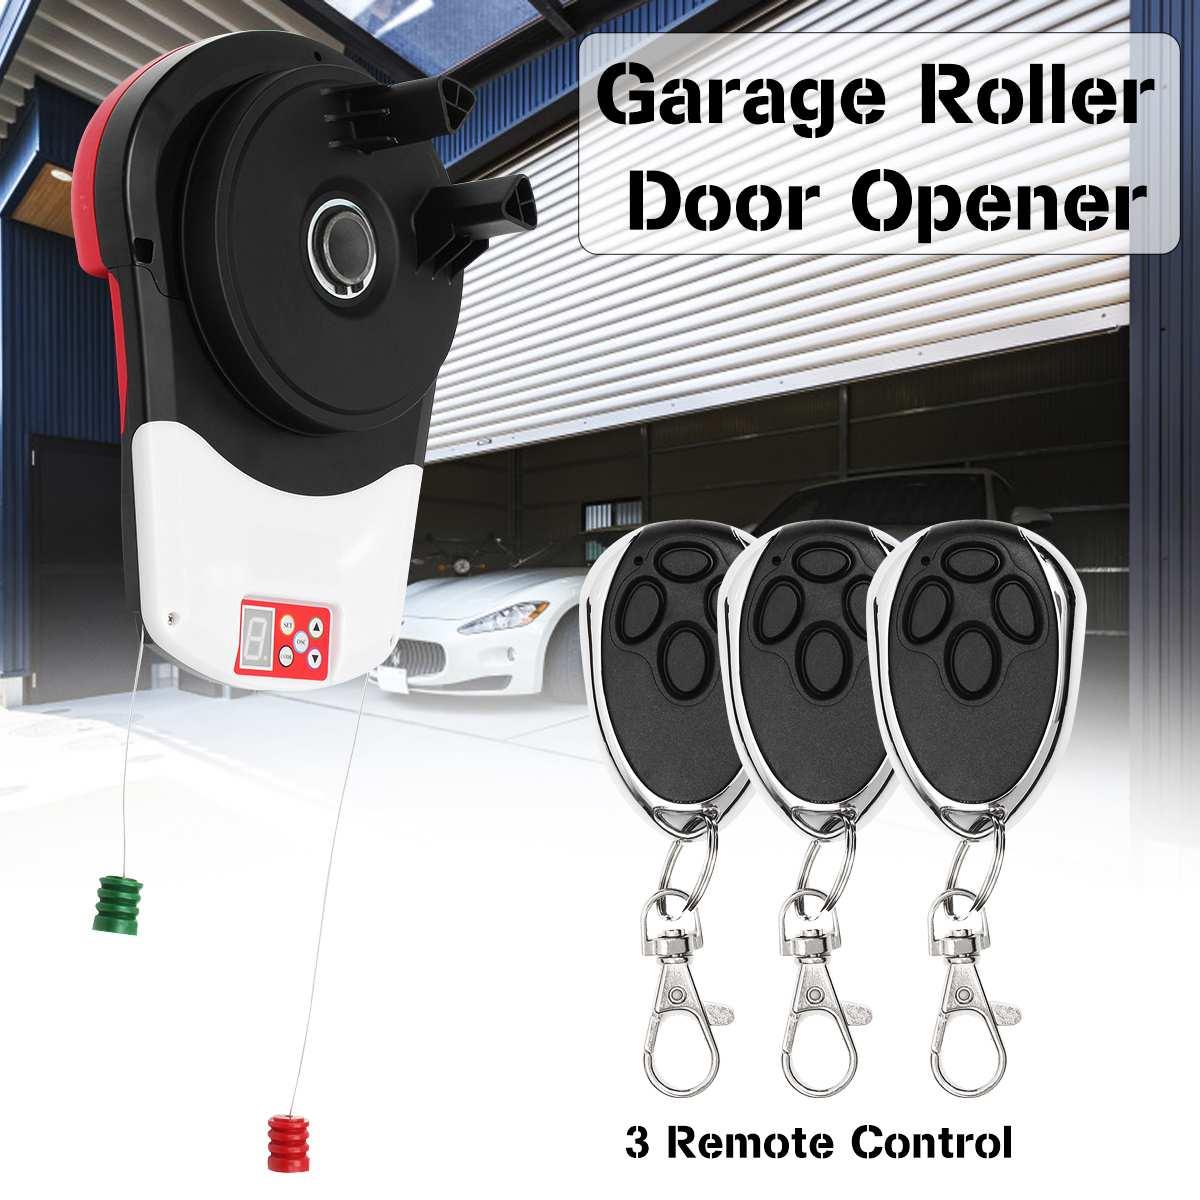 AC 220-240V Gate Opener Garage Roller Door Opener 3 Remote Control Electric Operator for Rolling Gate Automatic Door Operators